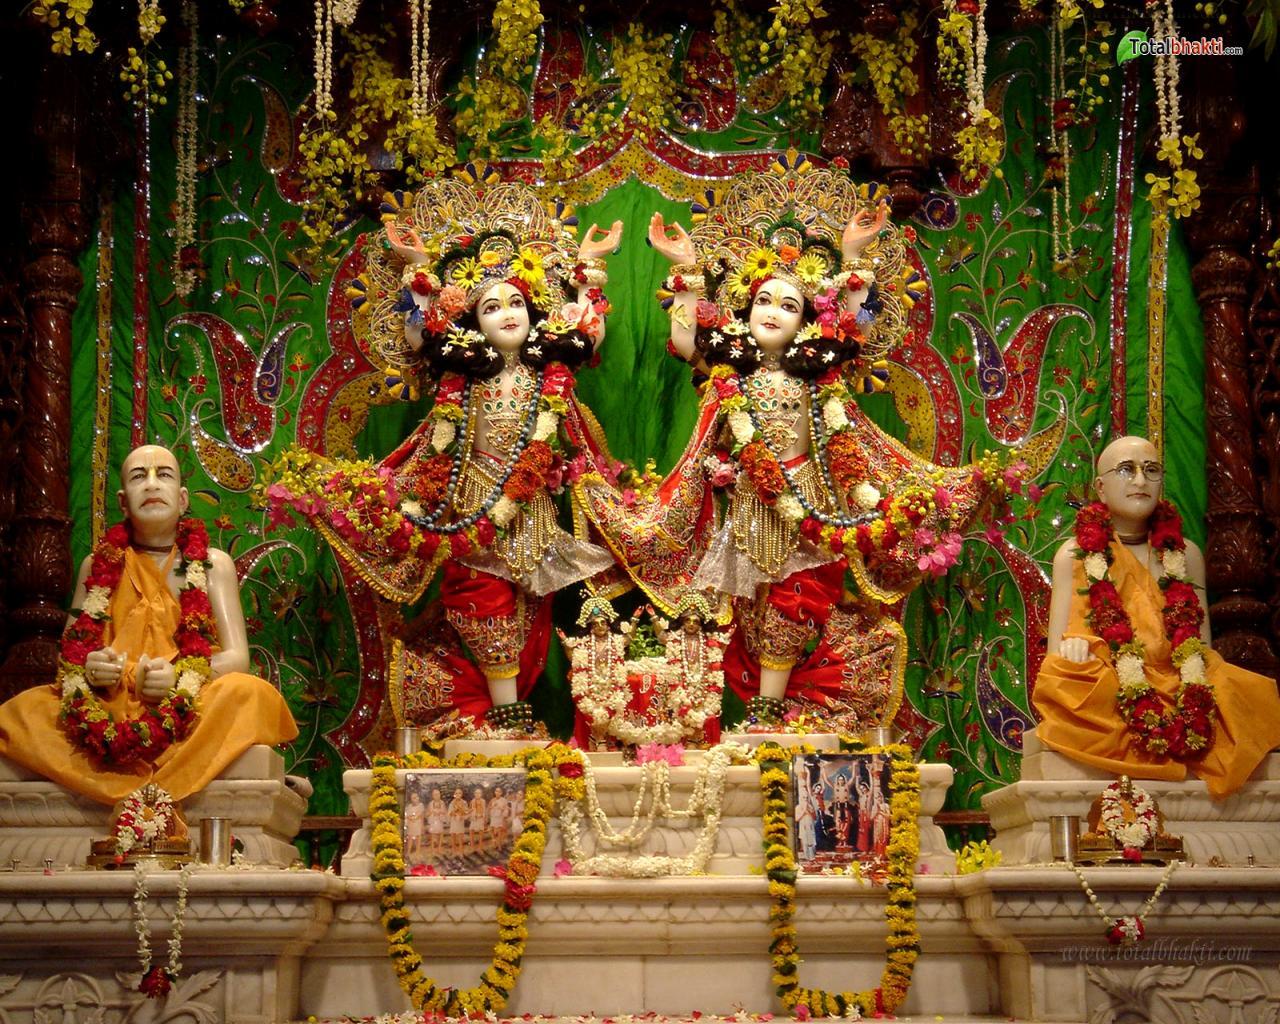 http://3.bp.blogspot.com/-g2Orwxwt2rY/UDX8Bmw7g3I/AAAAAAAACX8/0-Wo7Ttirh0/s1600/Lord-Krishna-wallpaper-855.jpg